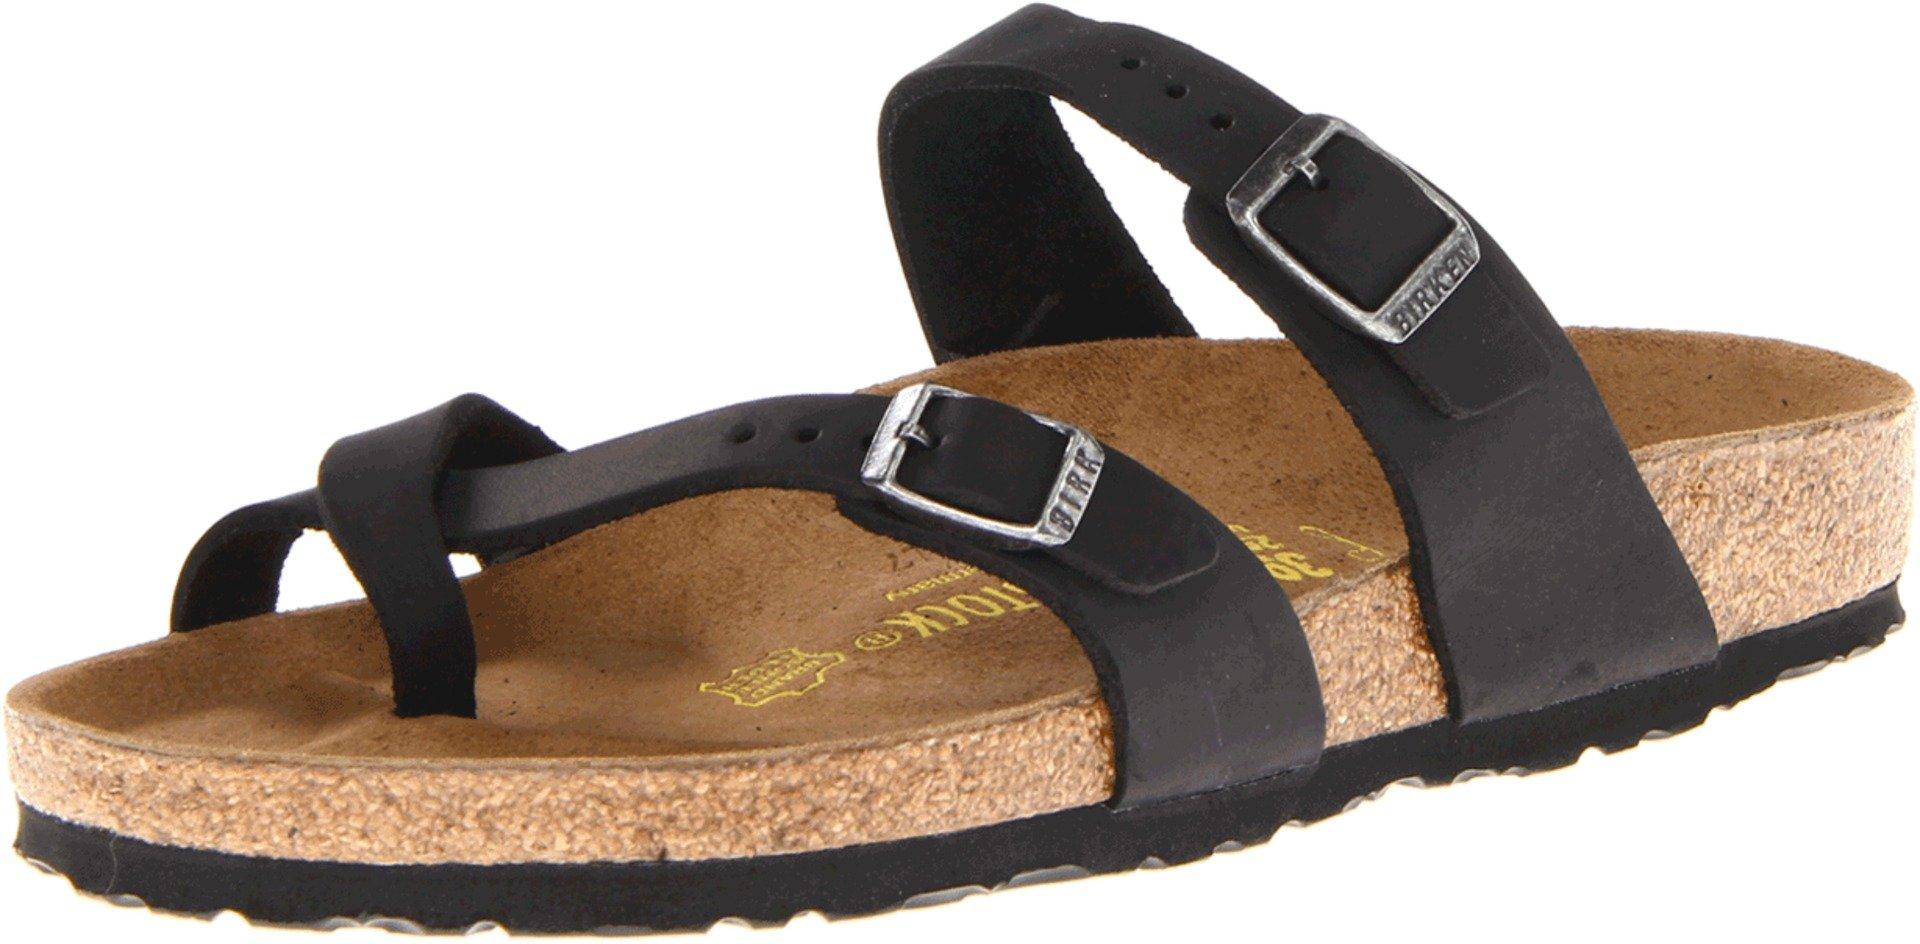 Birkenstock Women's Mayari Leather Thong Sandal,Black,EU Size 41 / Women's US Size 10-10.5